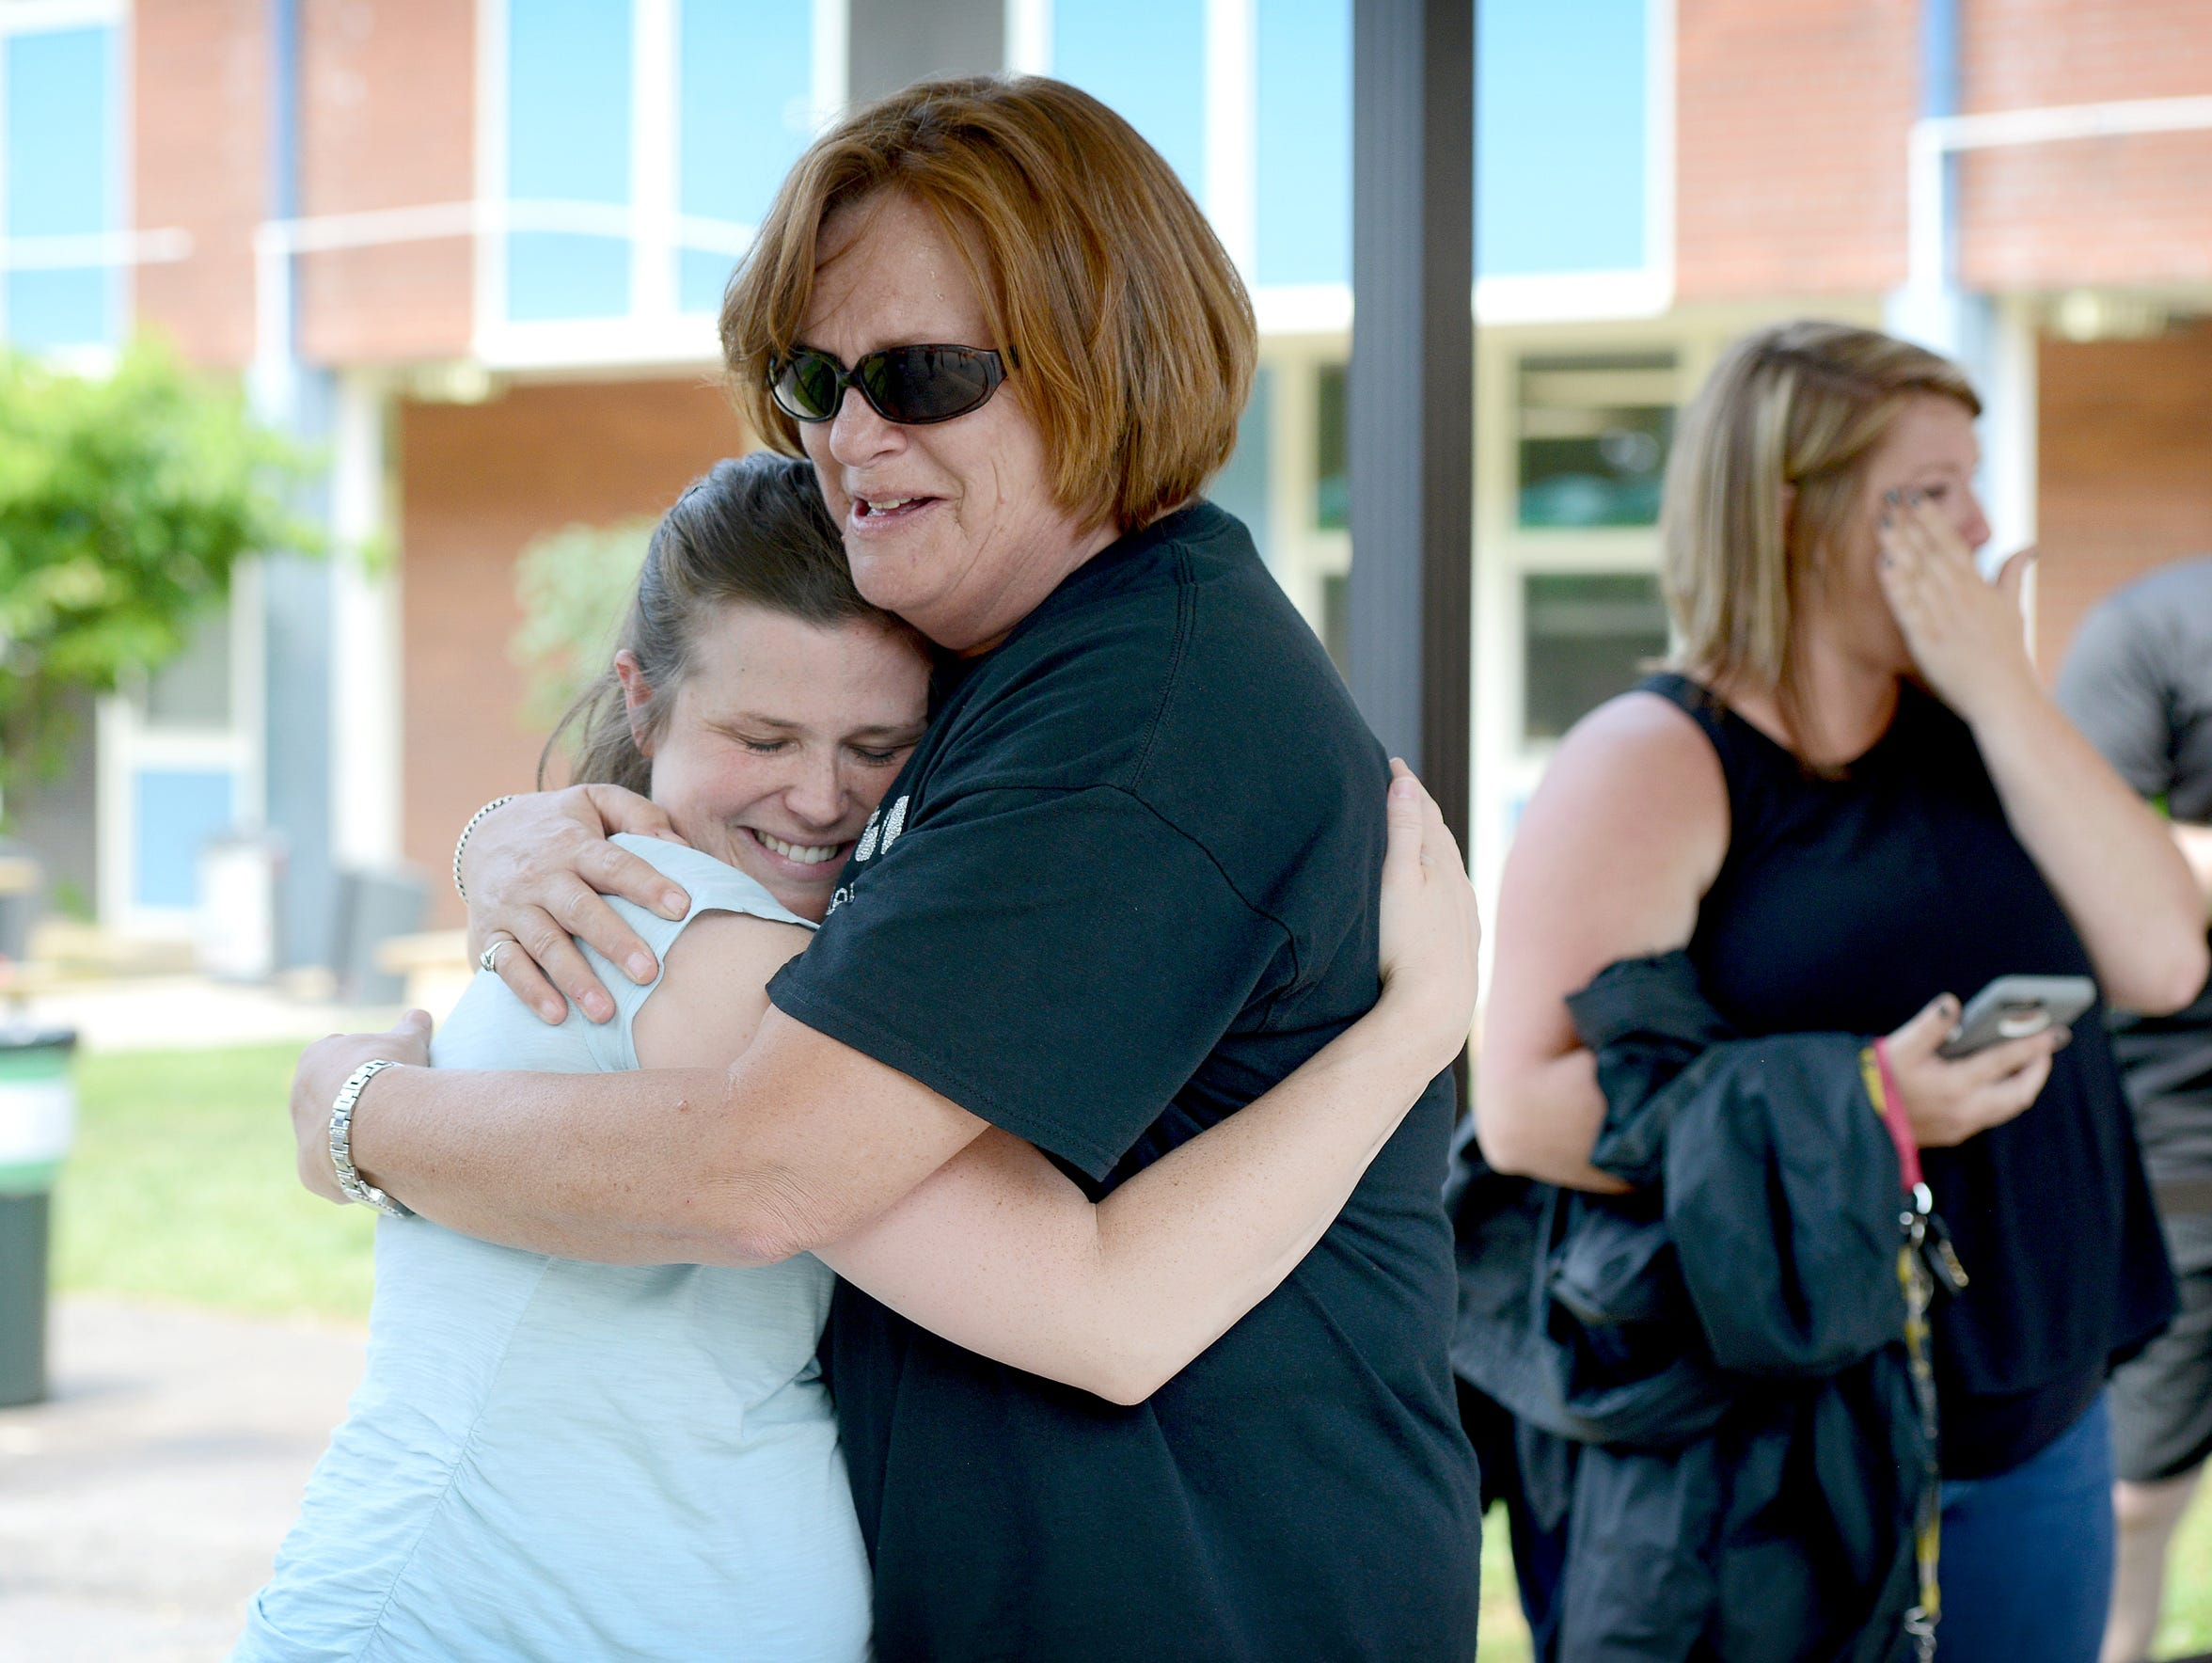 Fourth grade teacher Darsey Fox hugs her teaching assistant